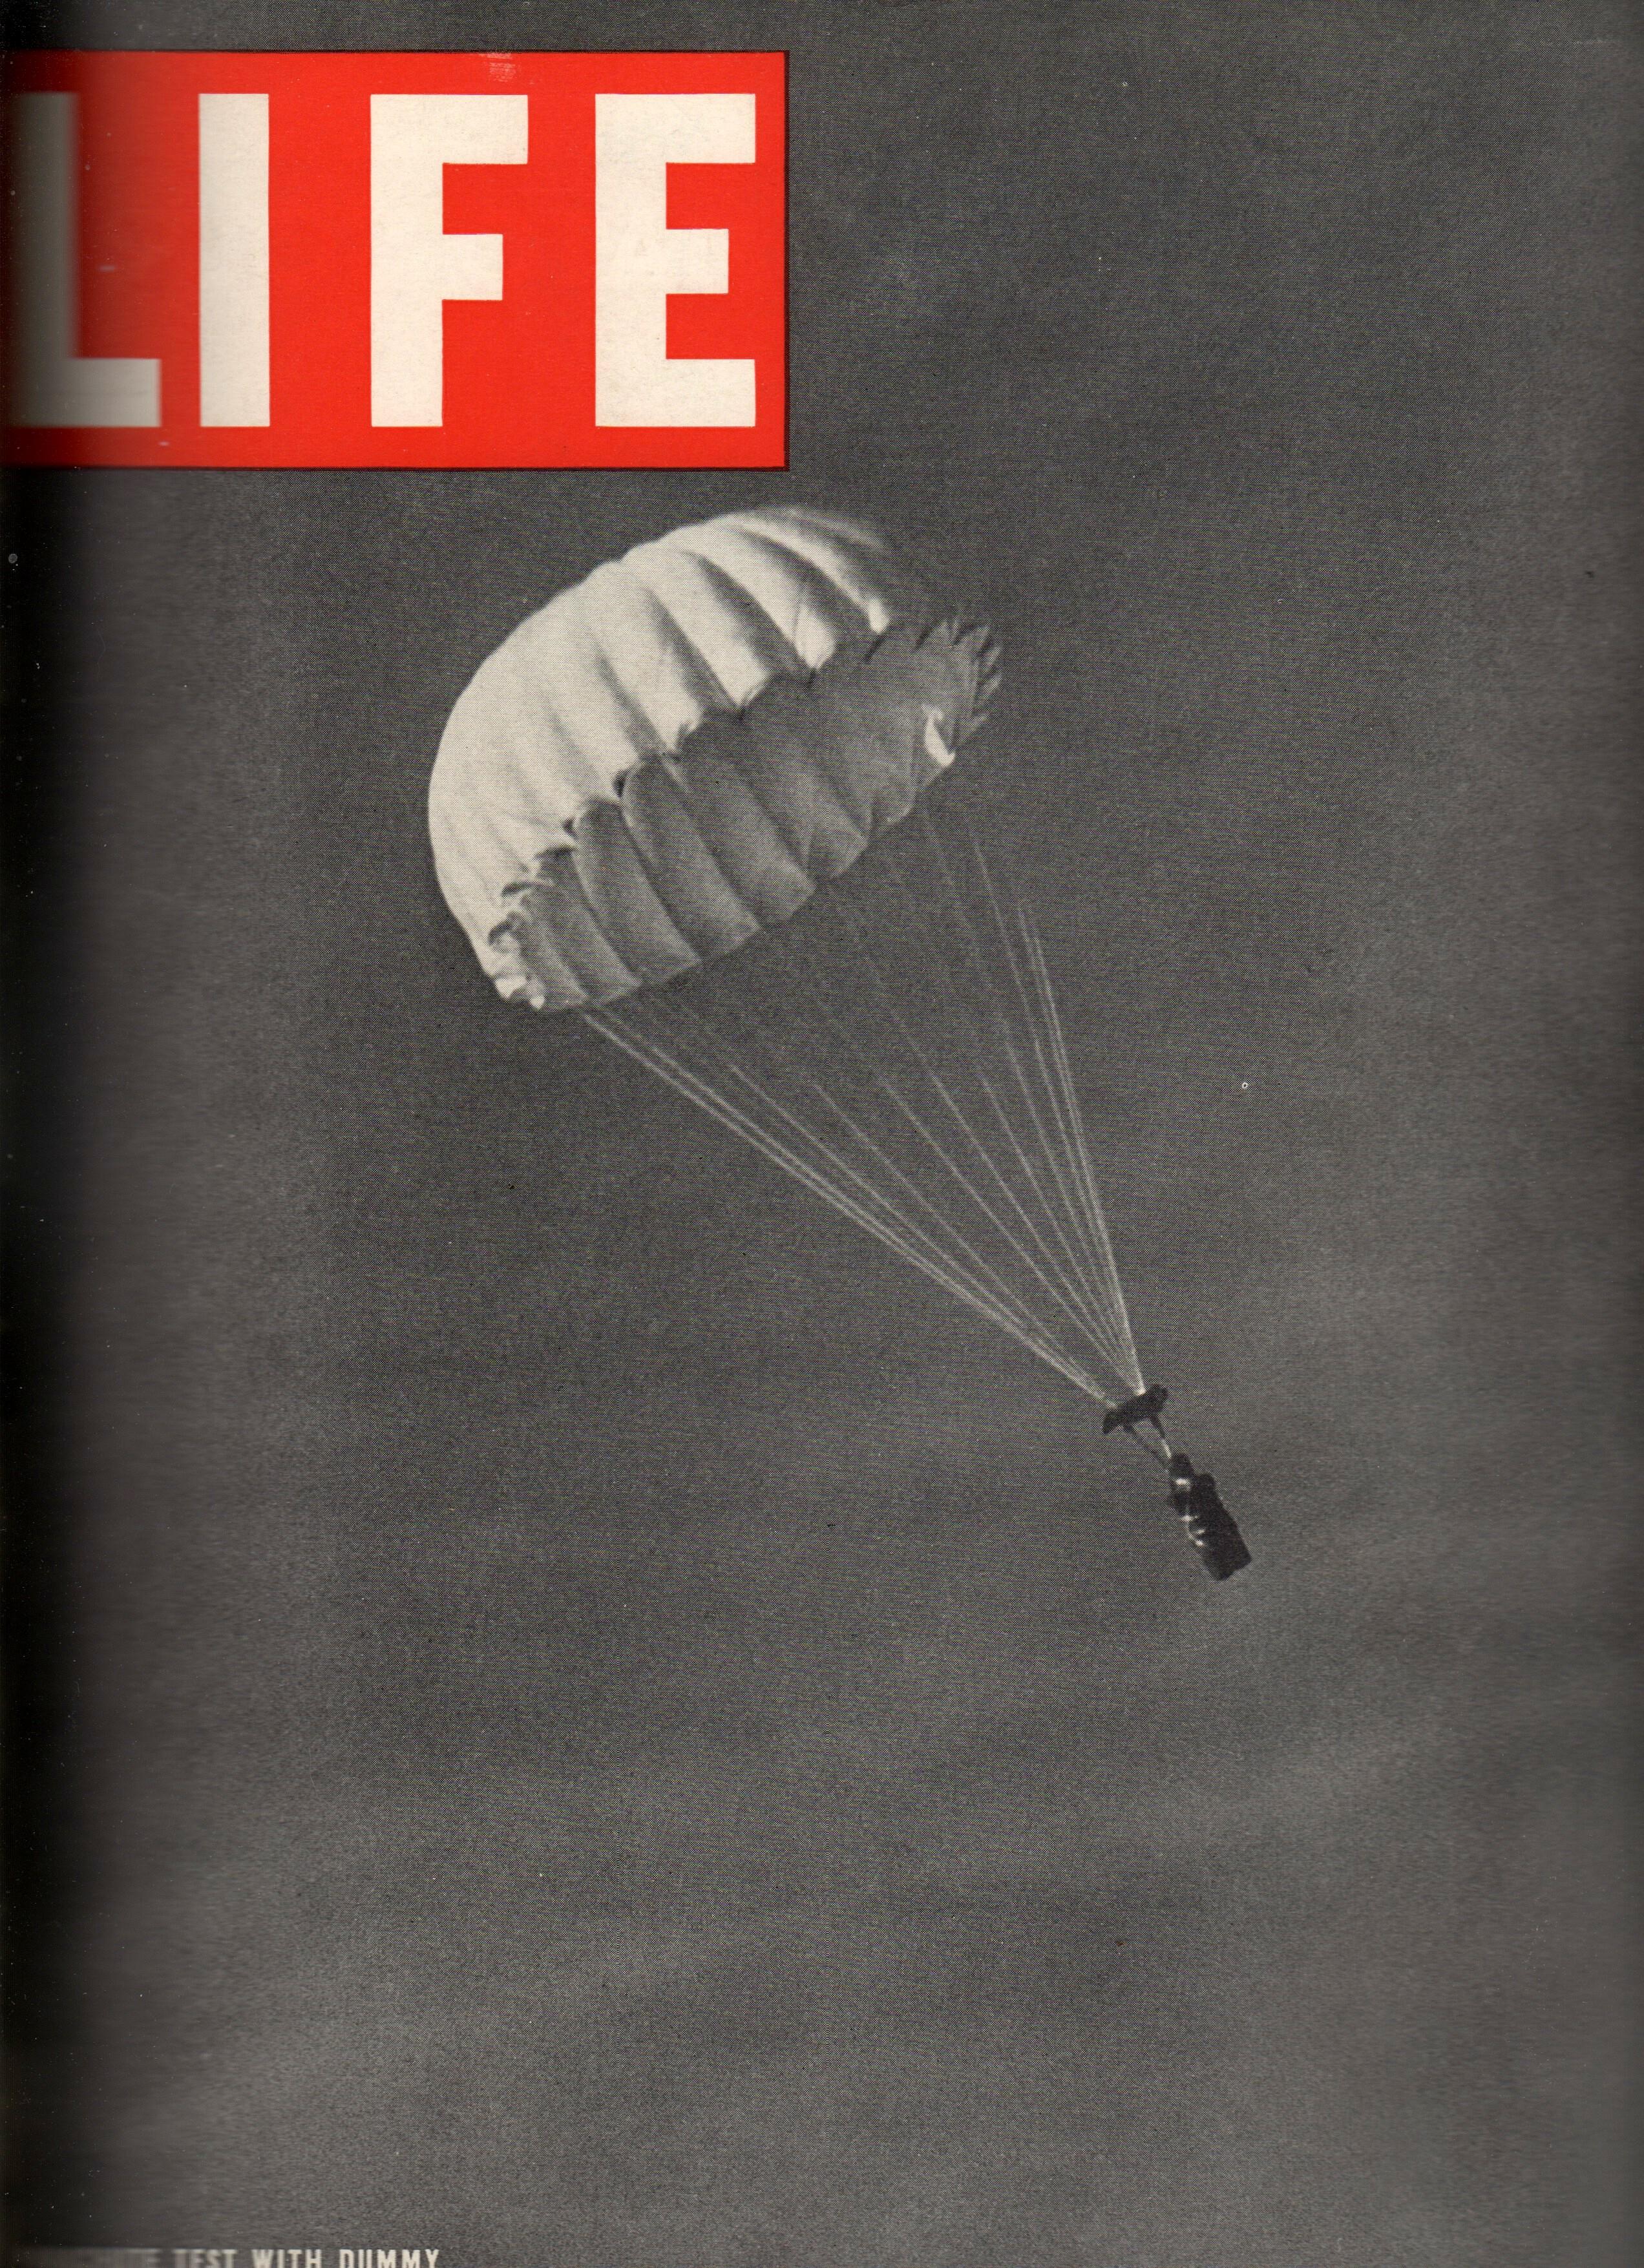 BOUND LIFE MAGAZINE OCTOBER - DECEMBER 1963